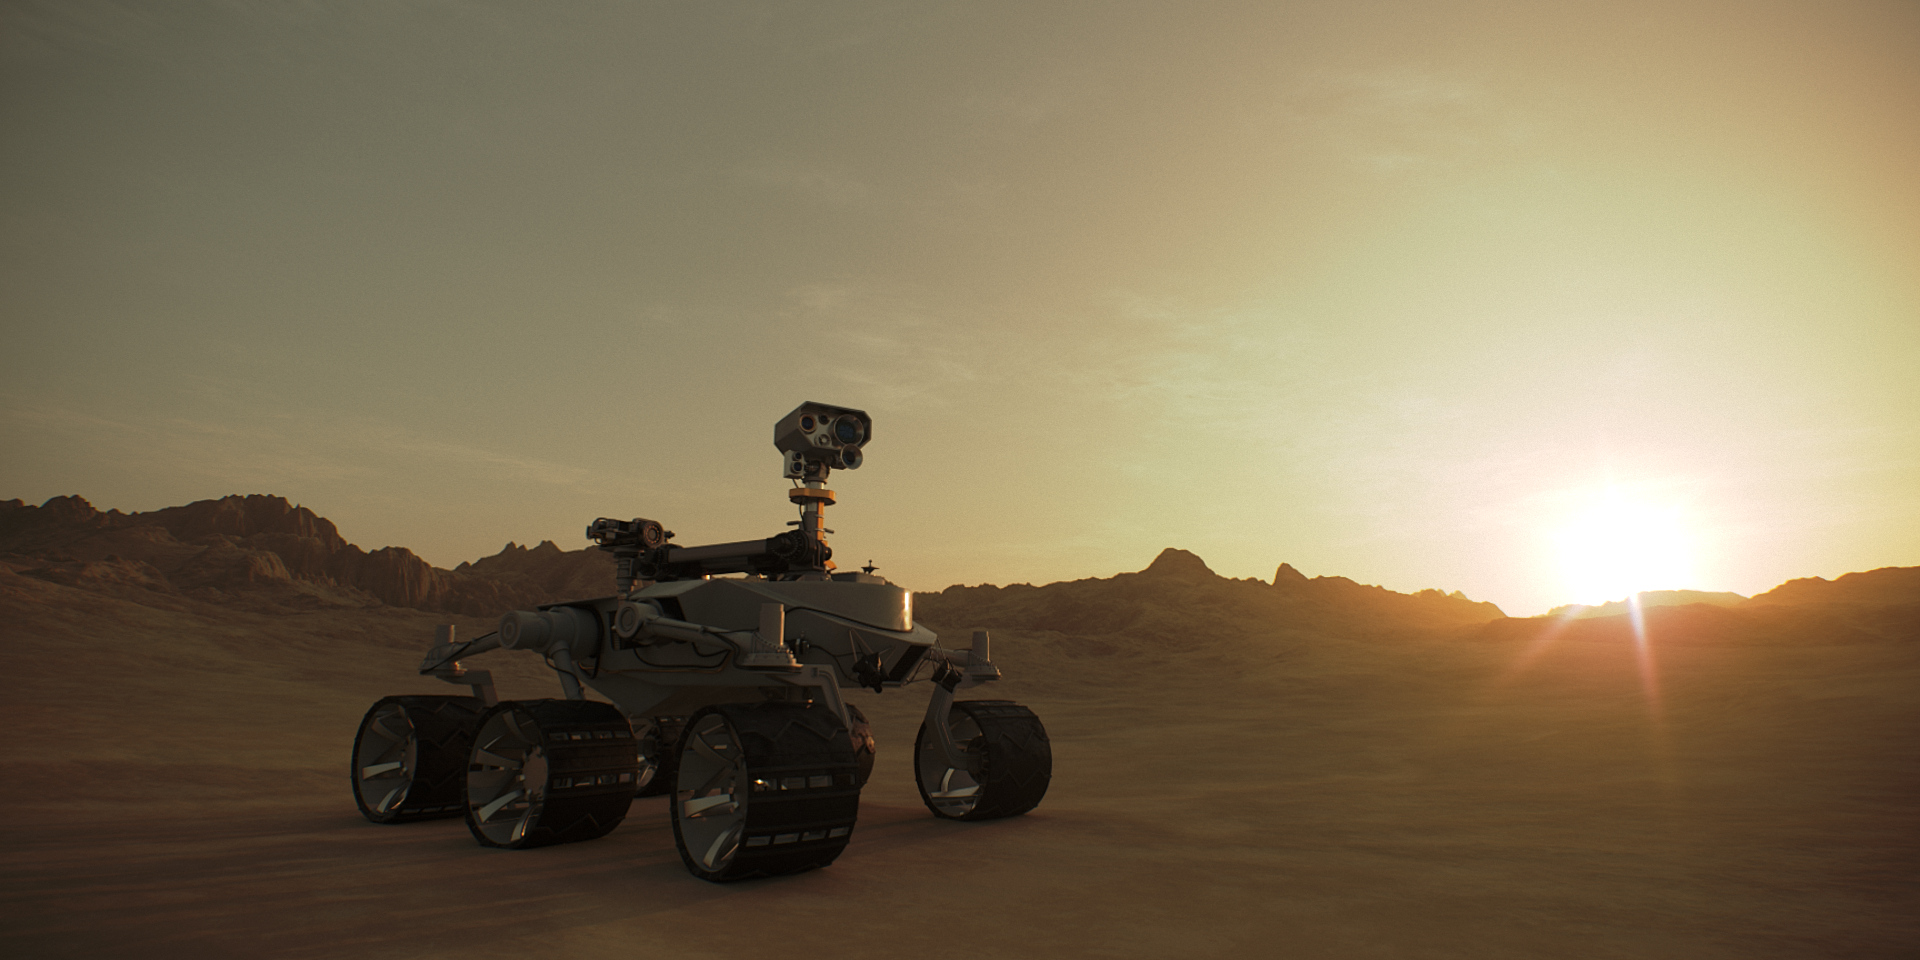 Rover Scene Alien Skies 01 Camera A.jpg